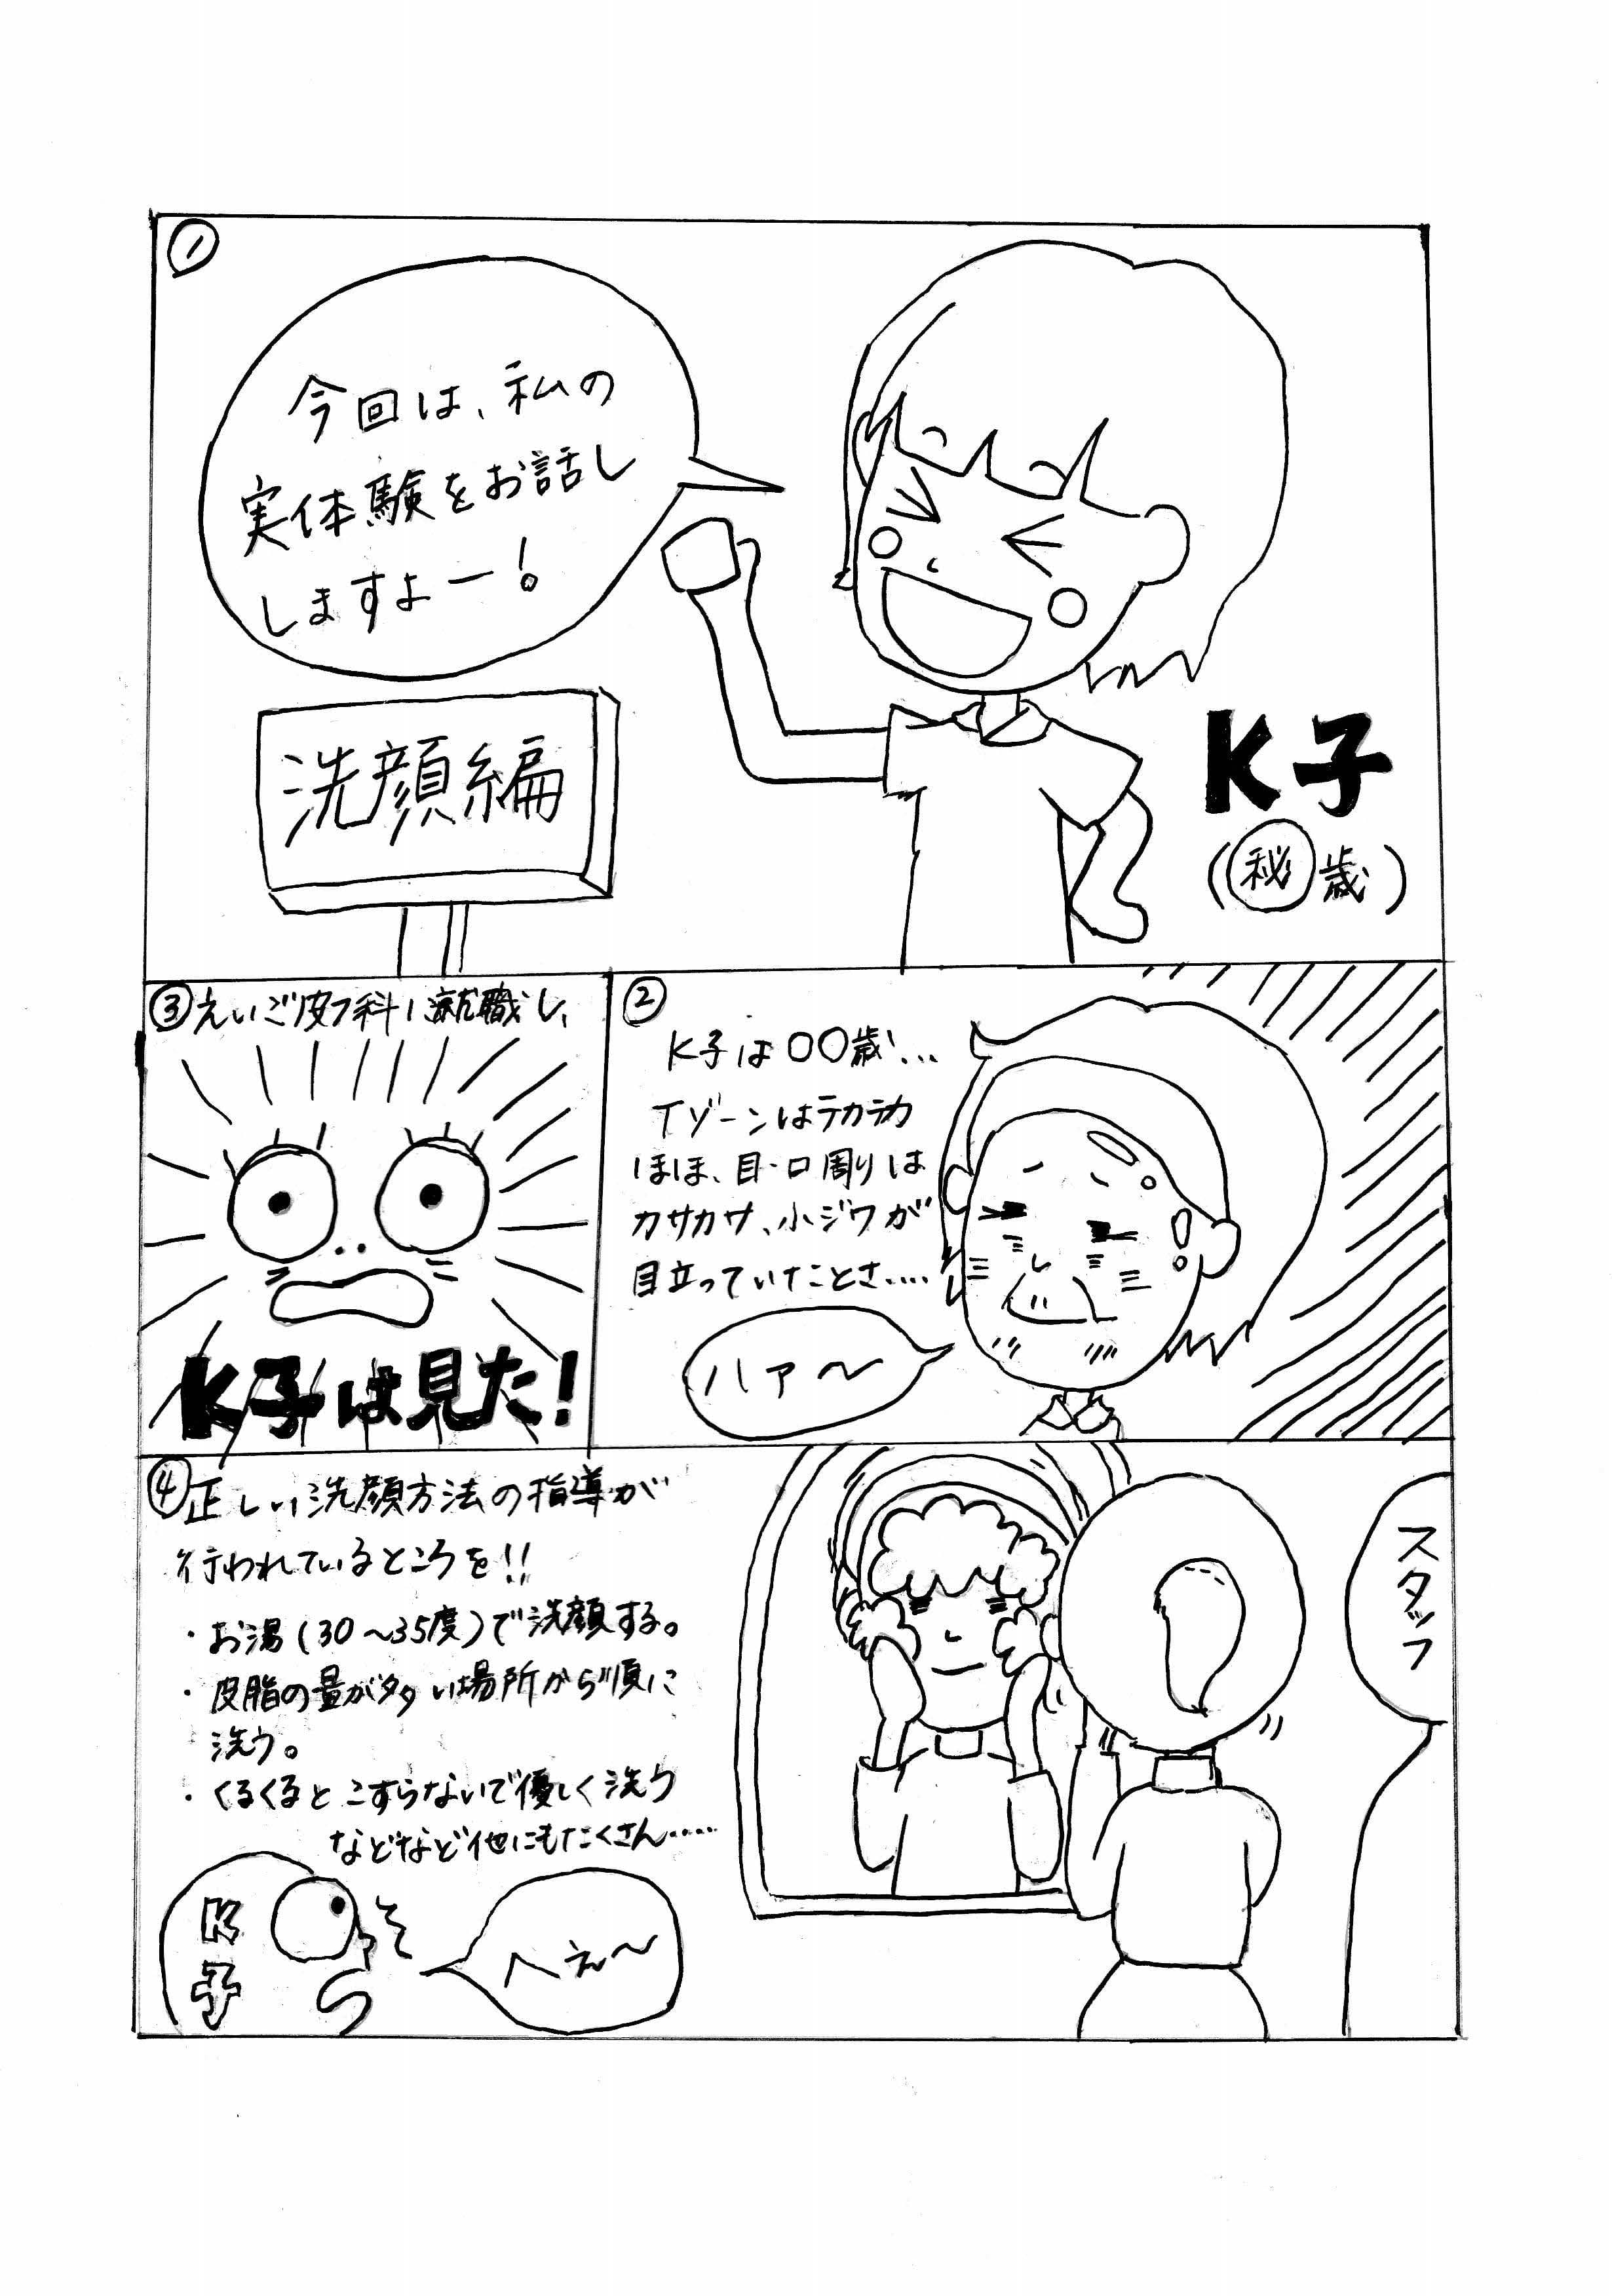 http://hifuka-eigo.com/osaka/blog/IMG_20180221_0001.jpg